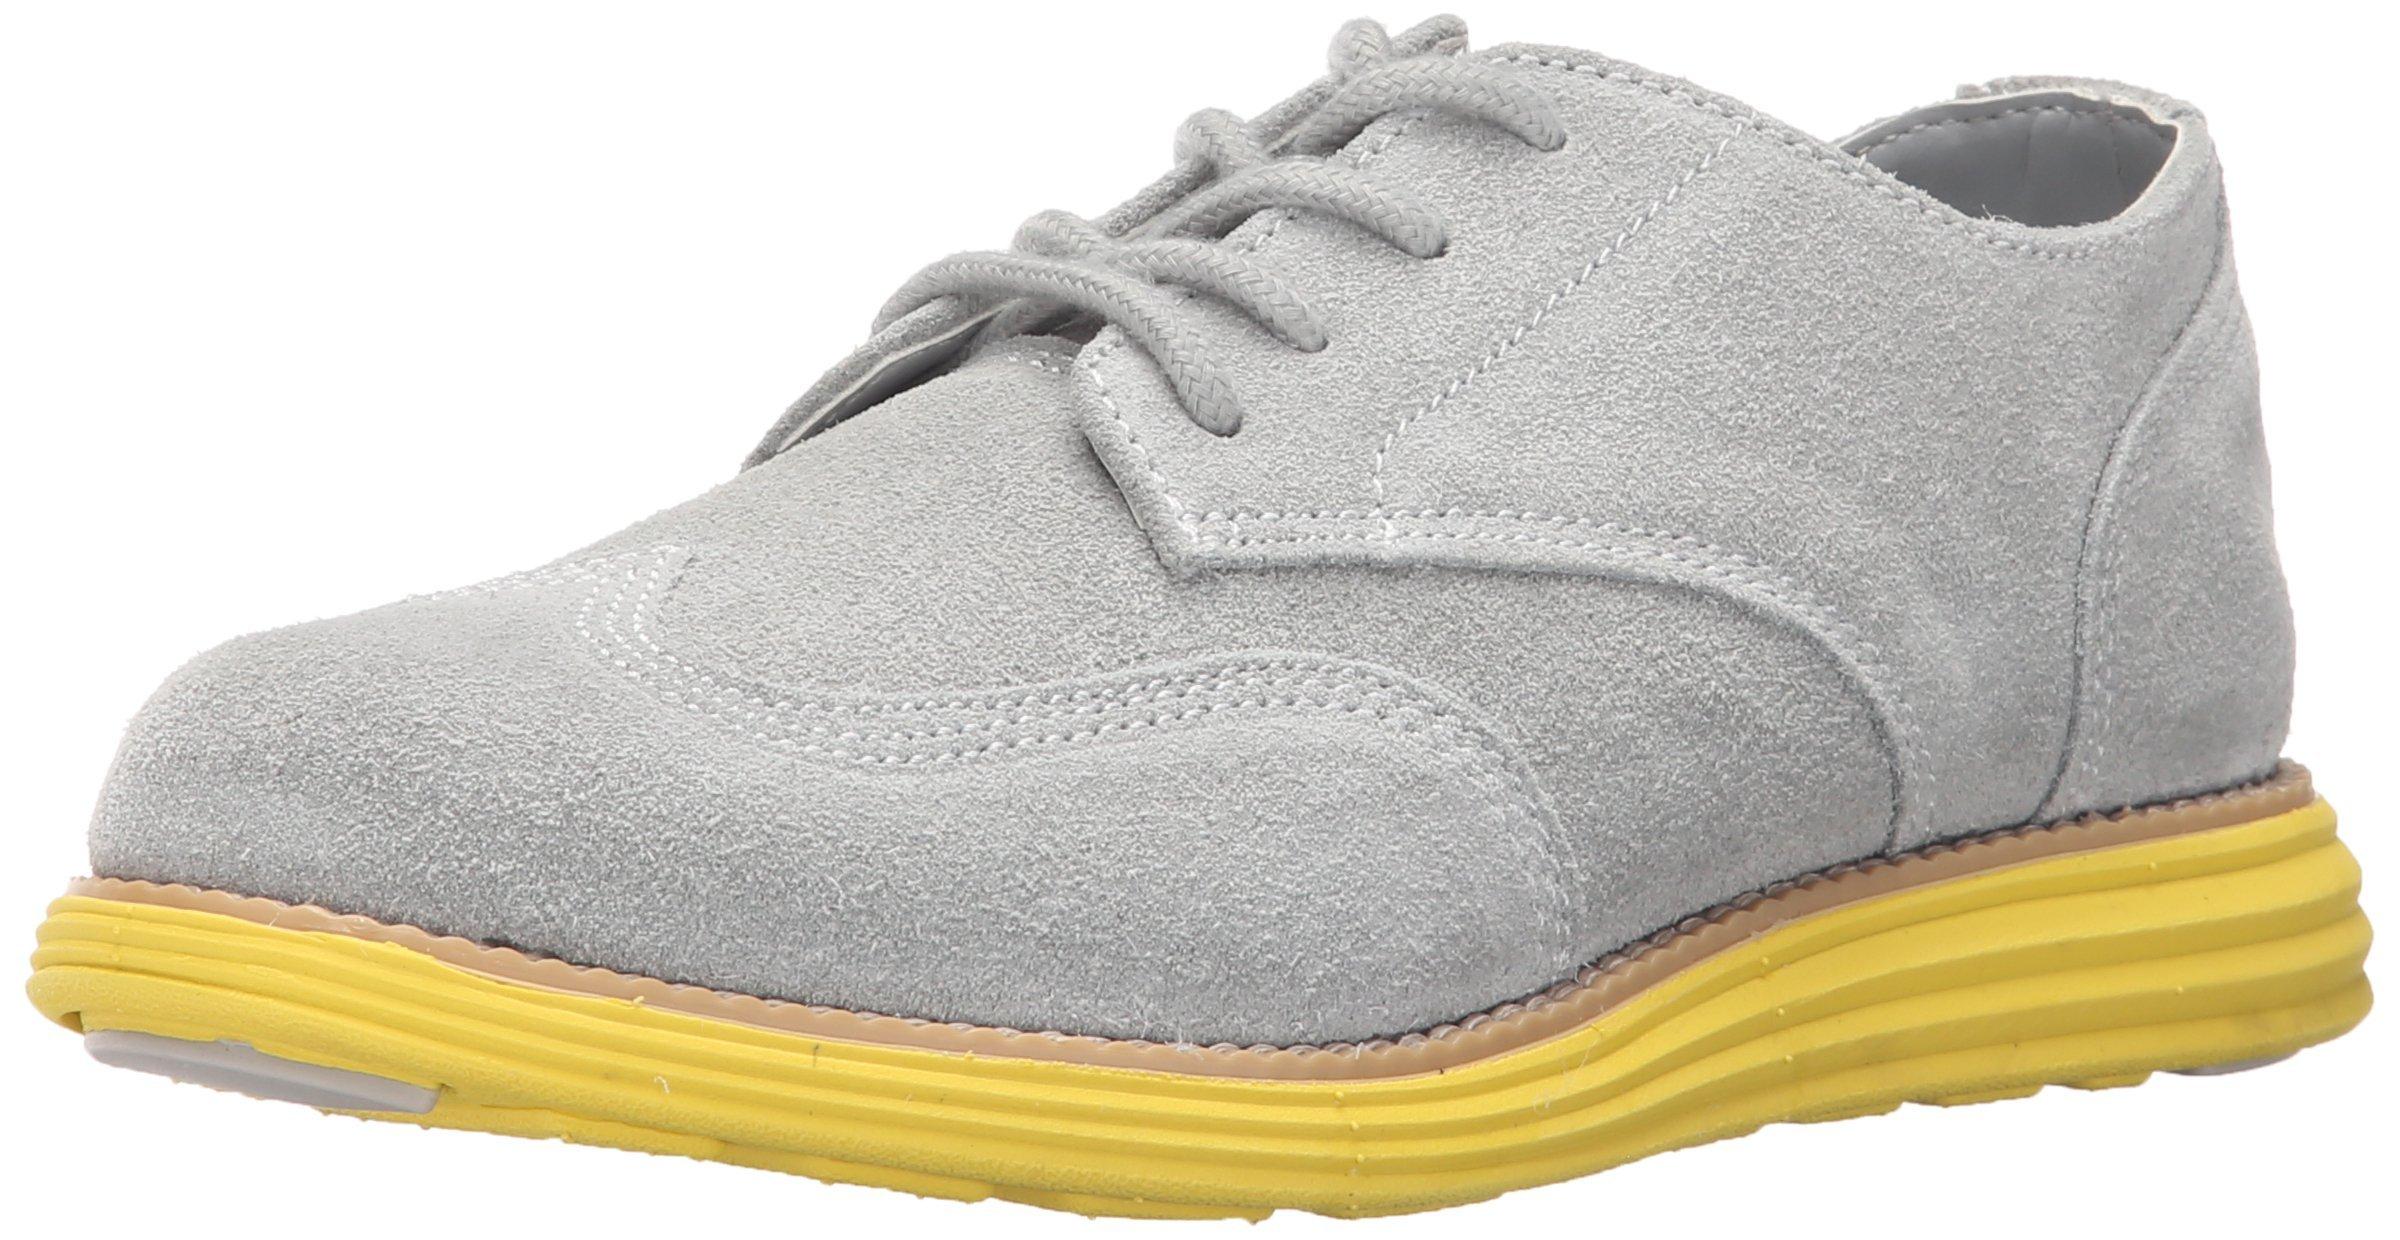 Cole Haan Boys' Grand Oxford 220003-K Sneaker Grey/Volt Yellow 13 M US Little Kid